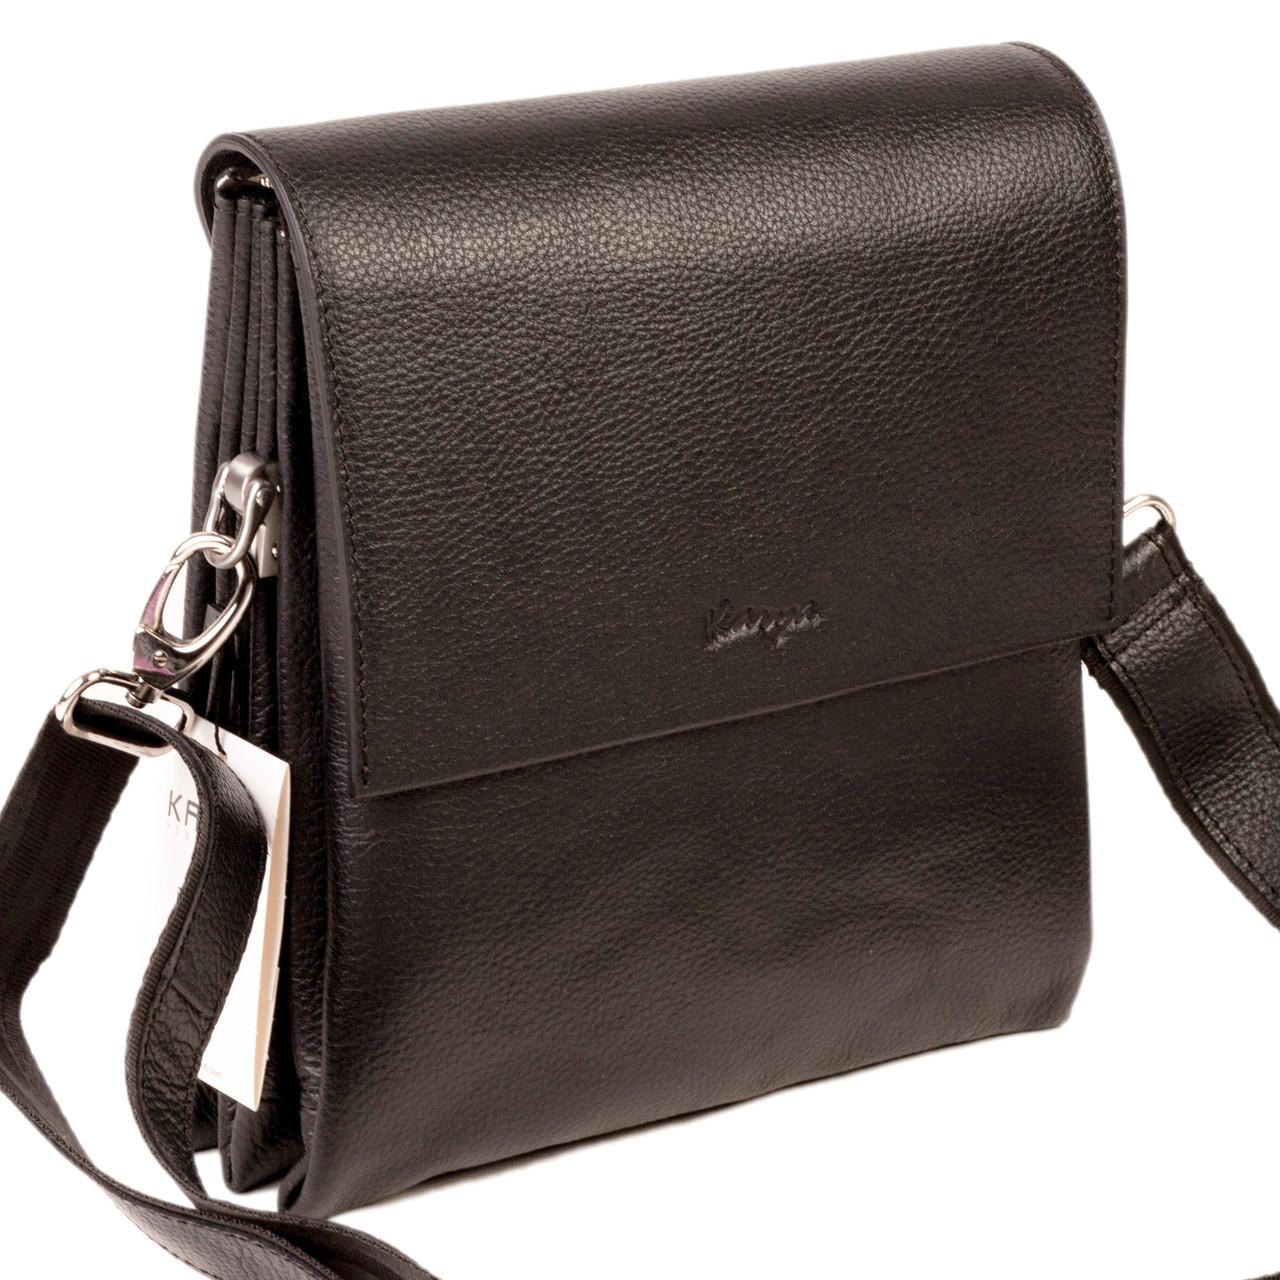 Мужская сумка Karya 0542-45 кожаная черная с плечевым ремнем